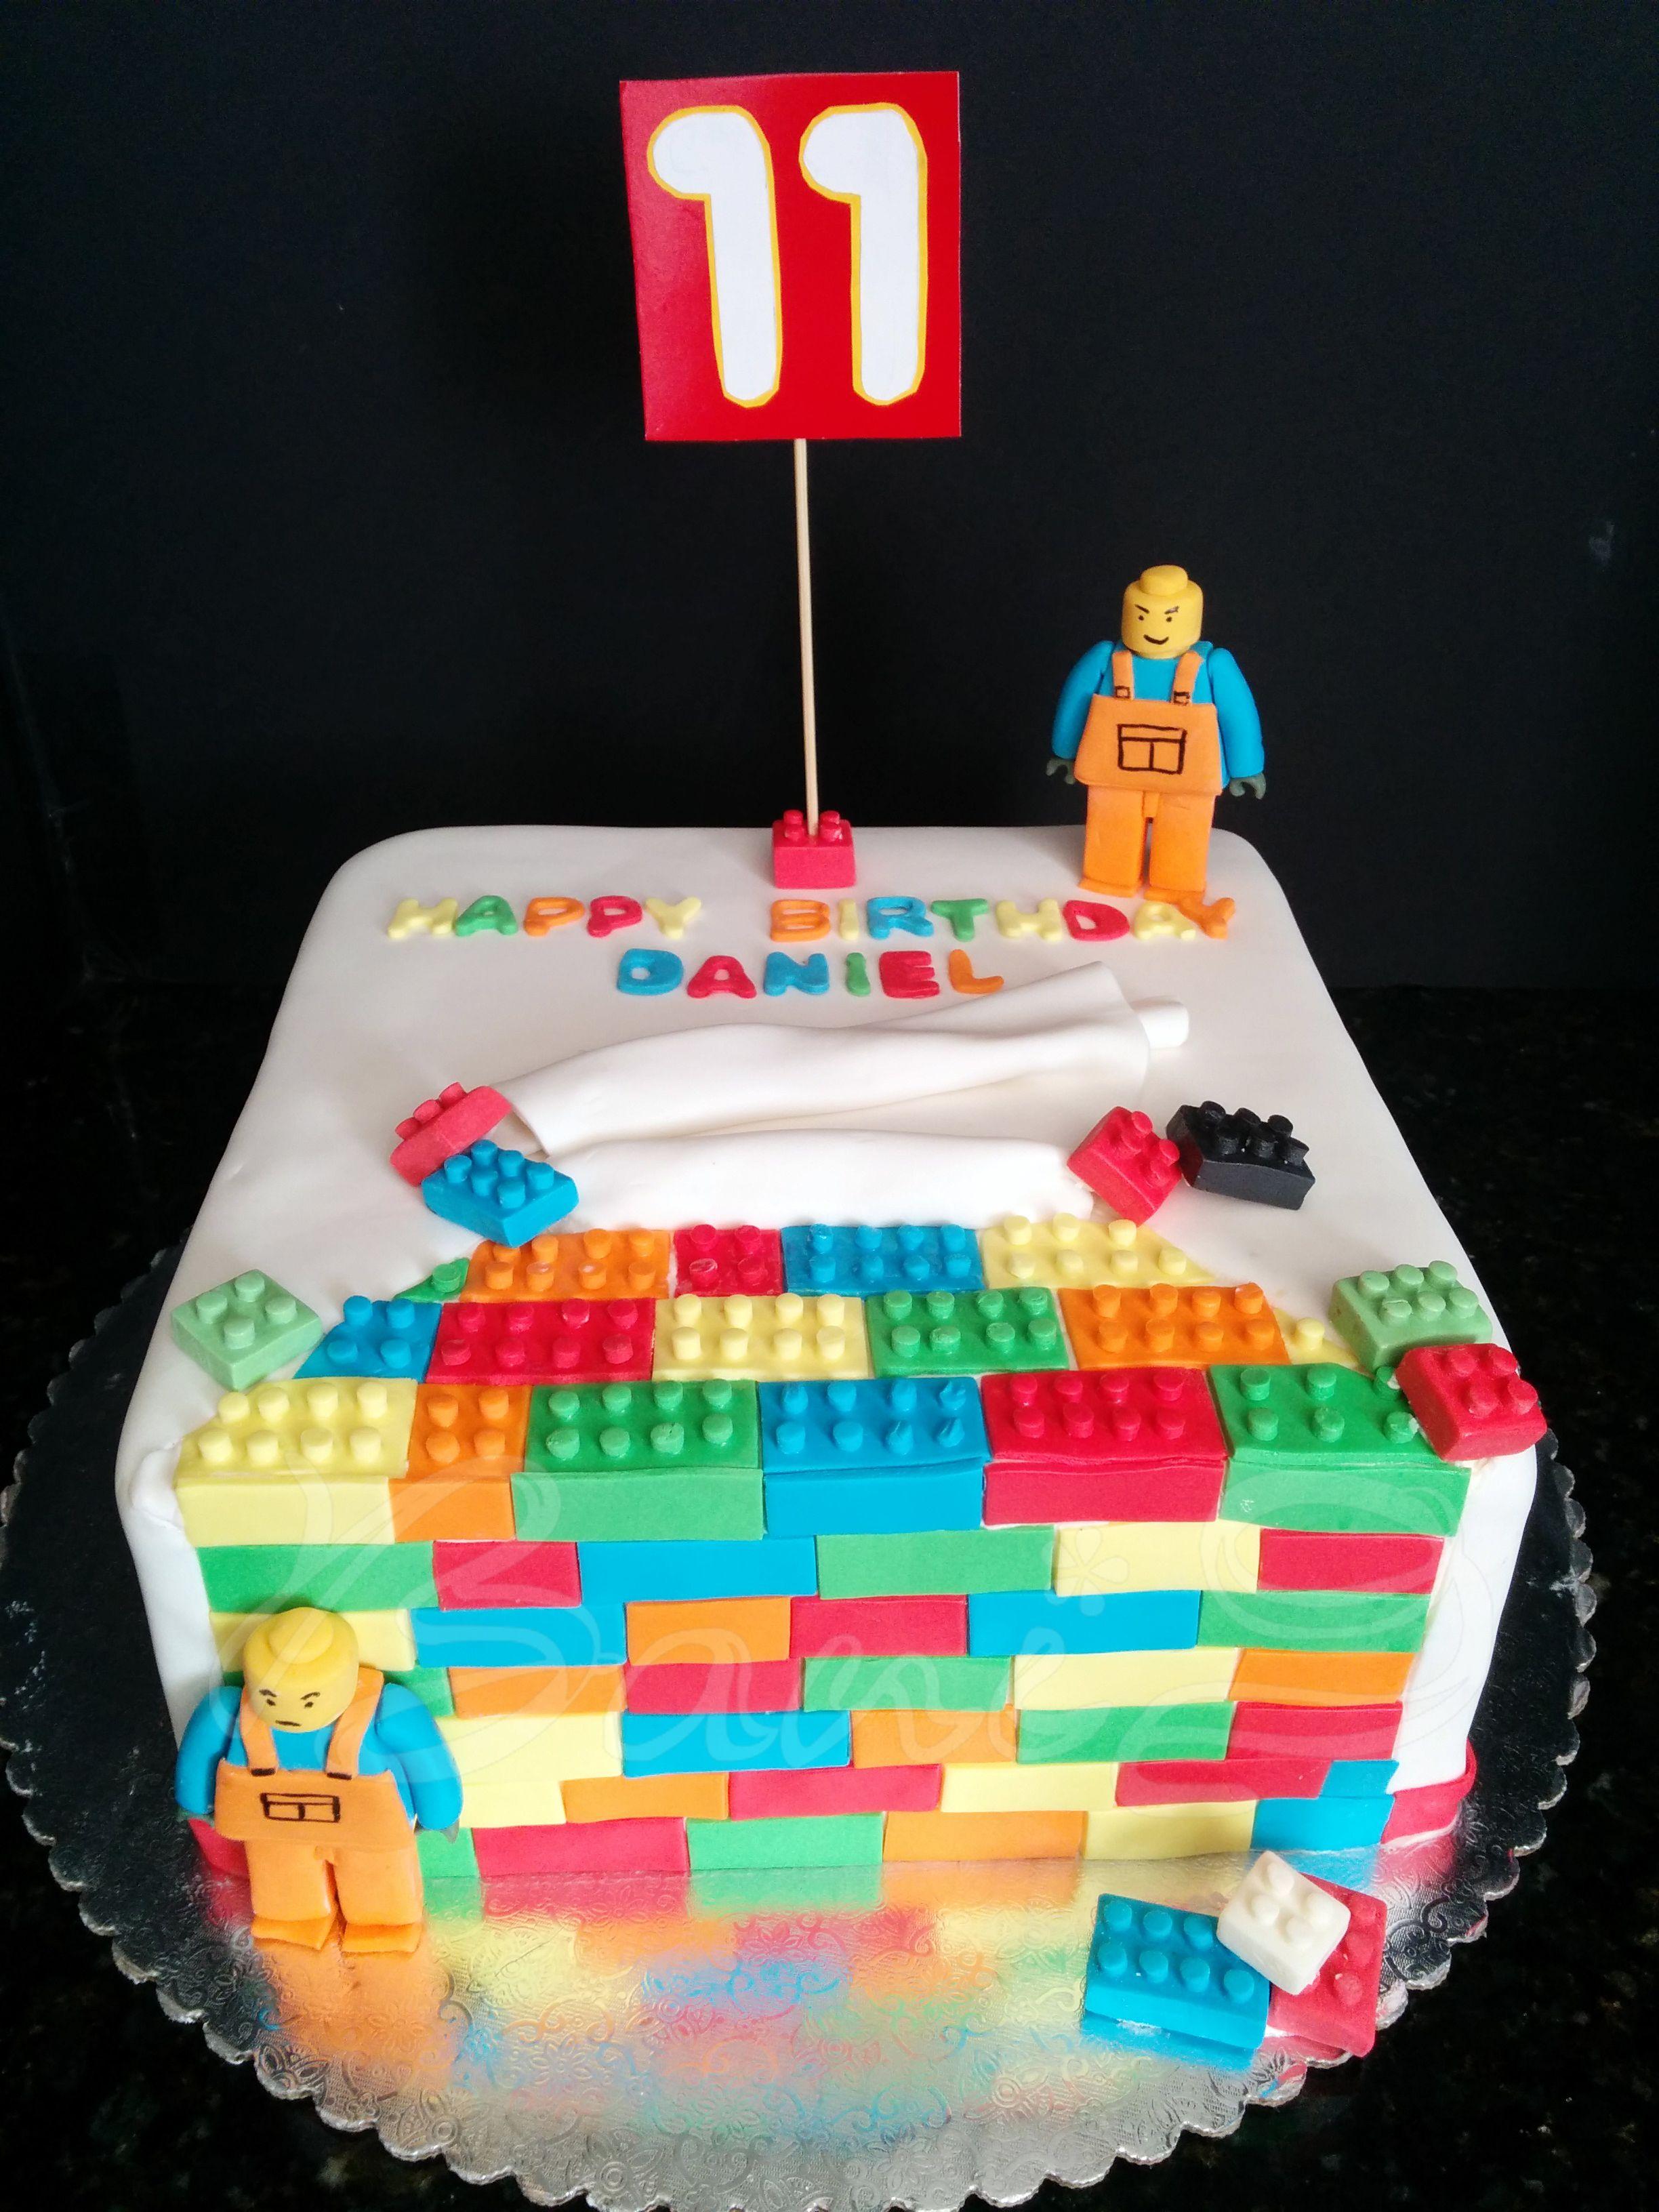 Lego Cake 10 Square Cake For Boy Bani Bakery Cakes For Boys Cake Square Cakes